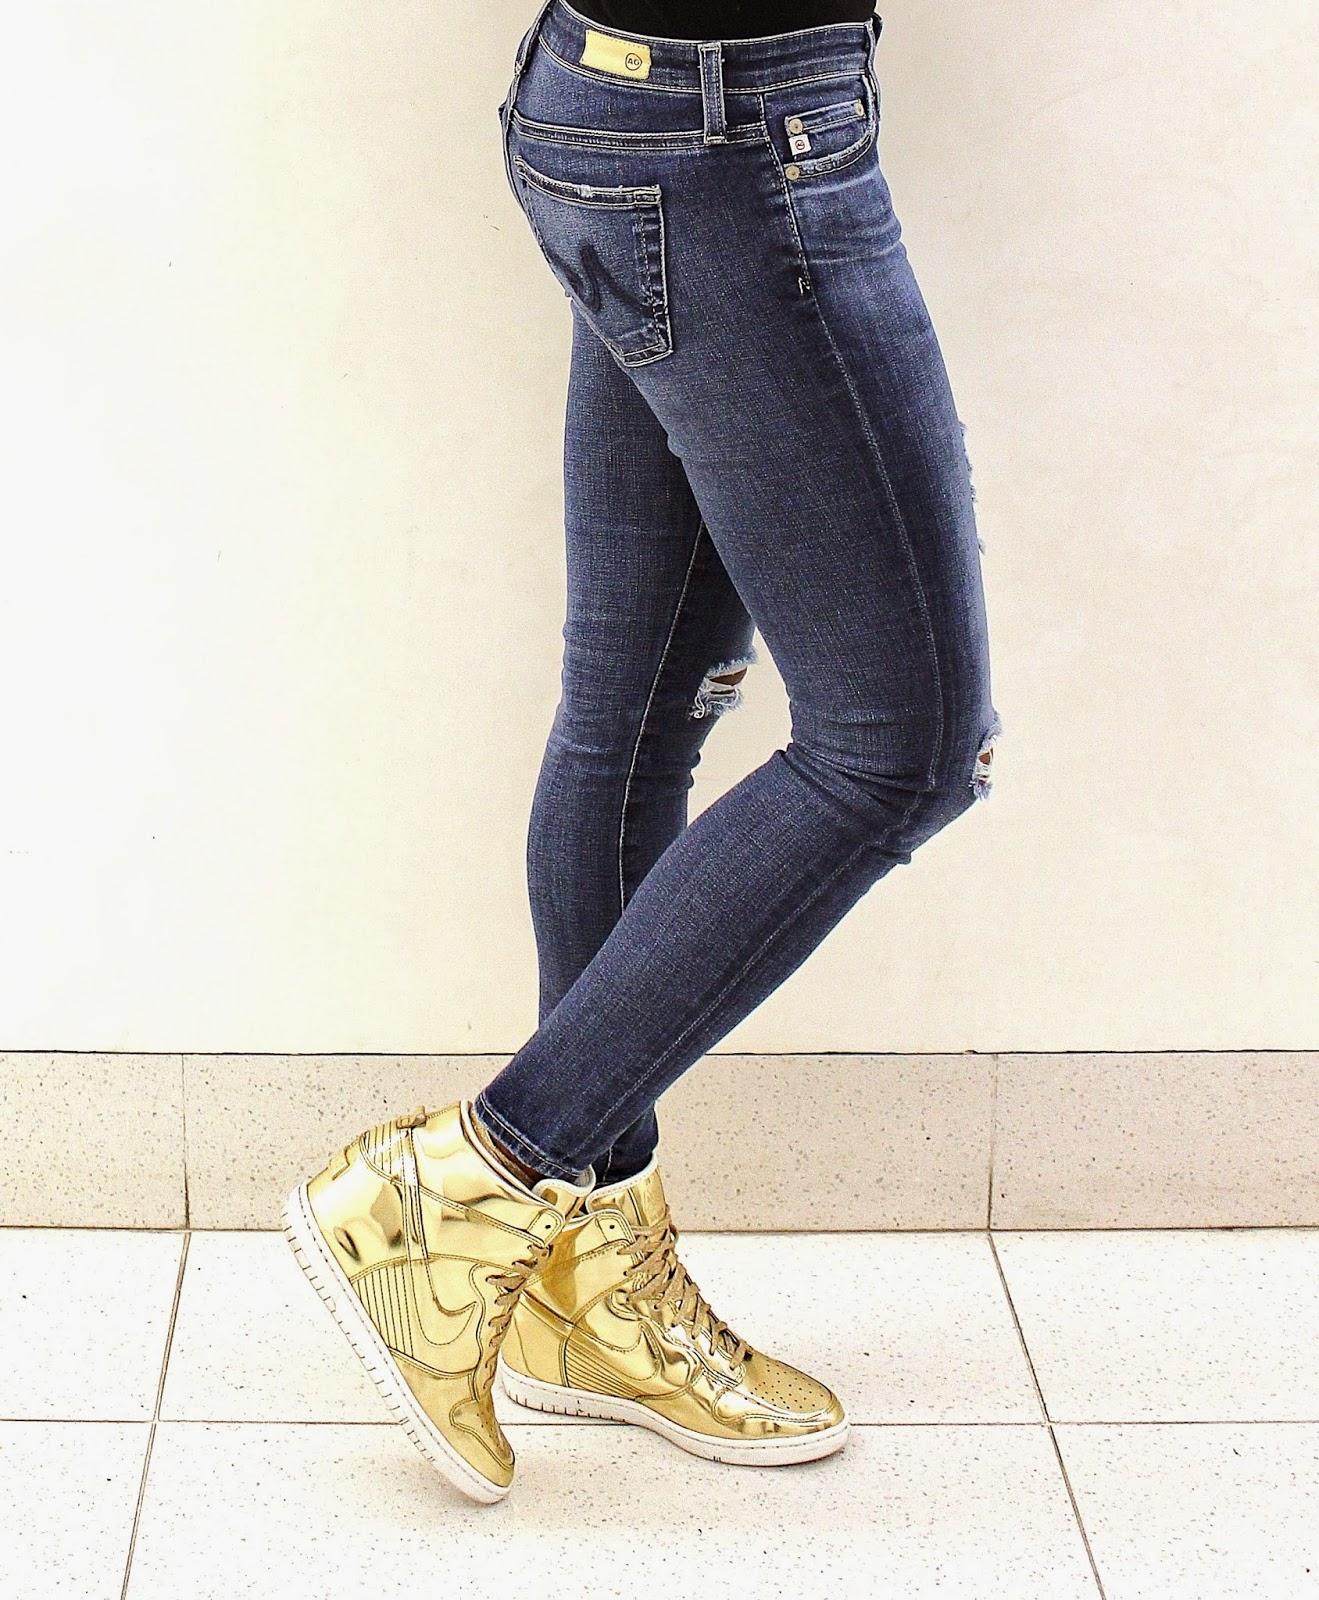 Nike Liquid Gold